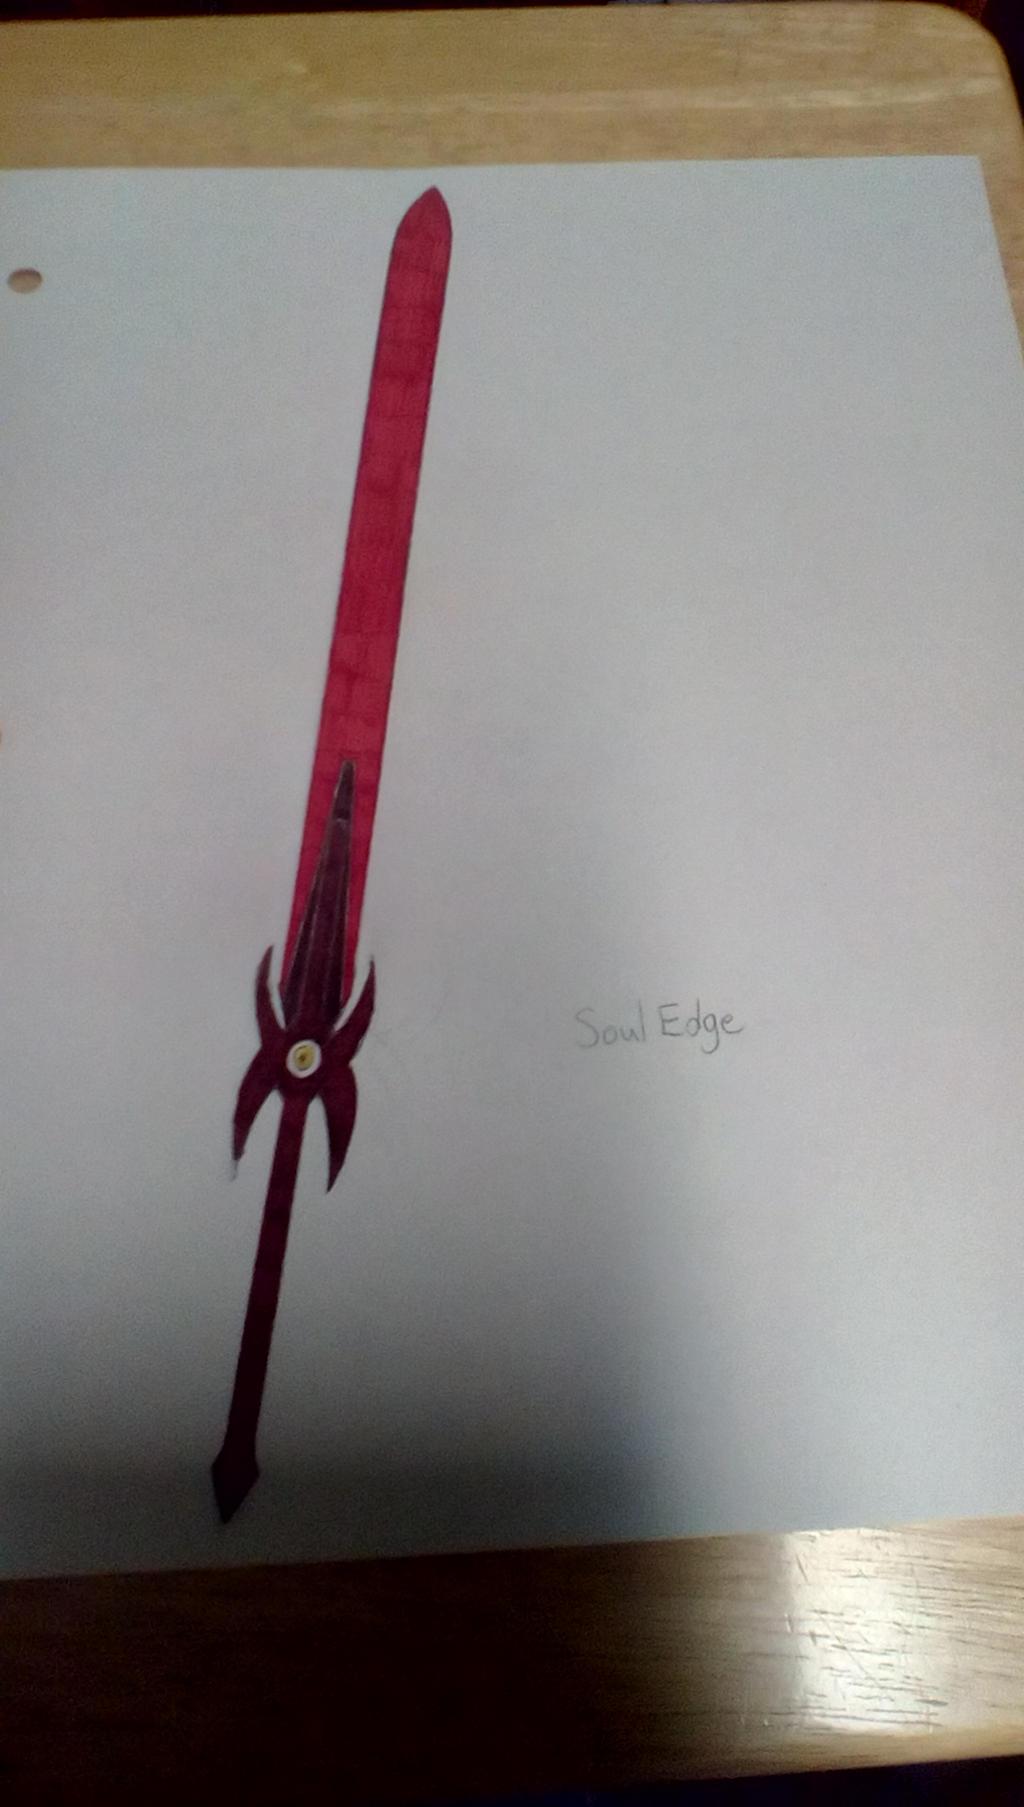 Soul Edge by Brightsworth-Heroes